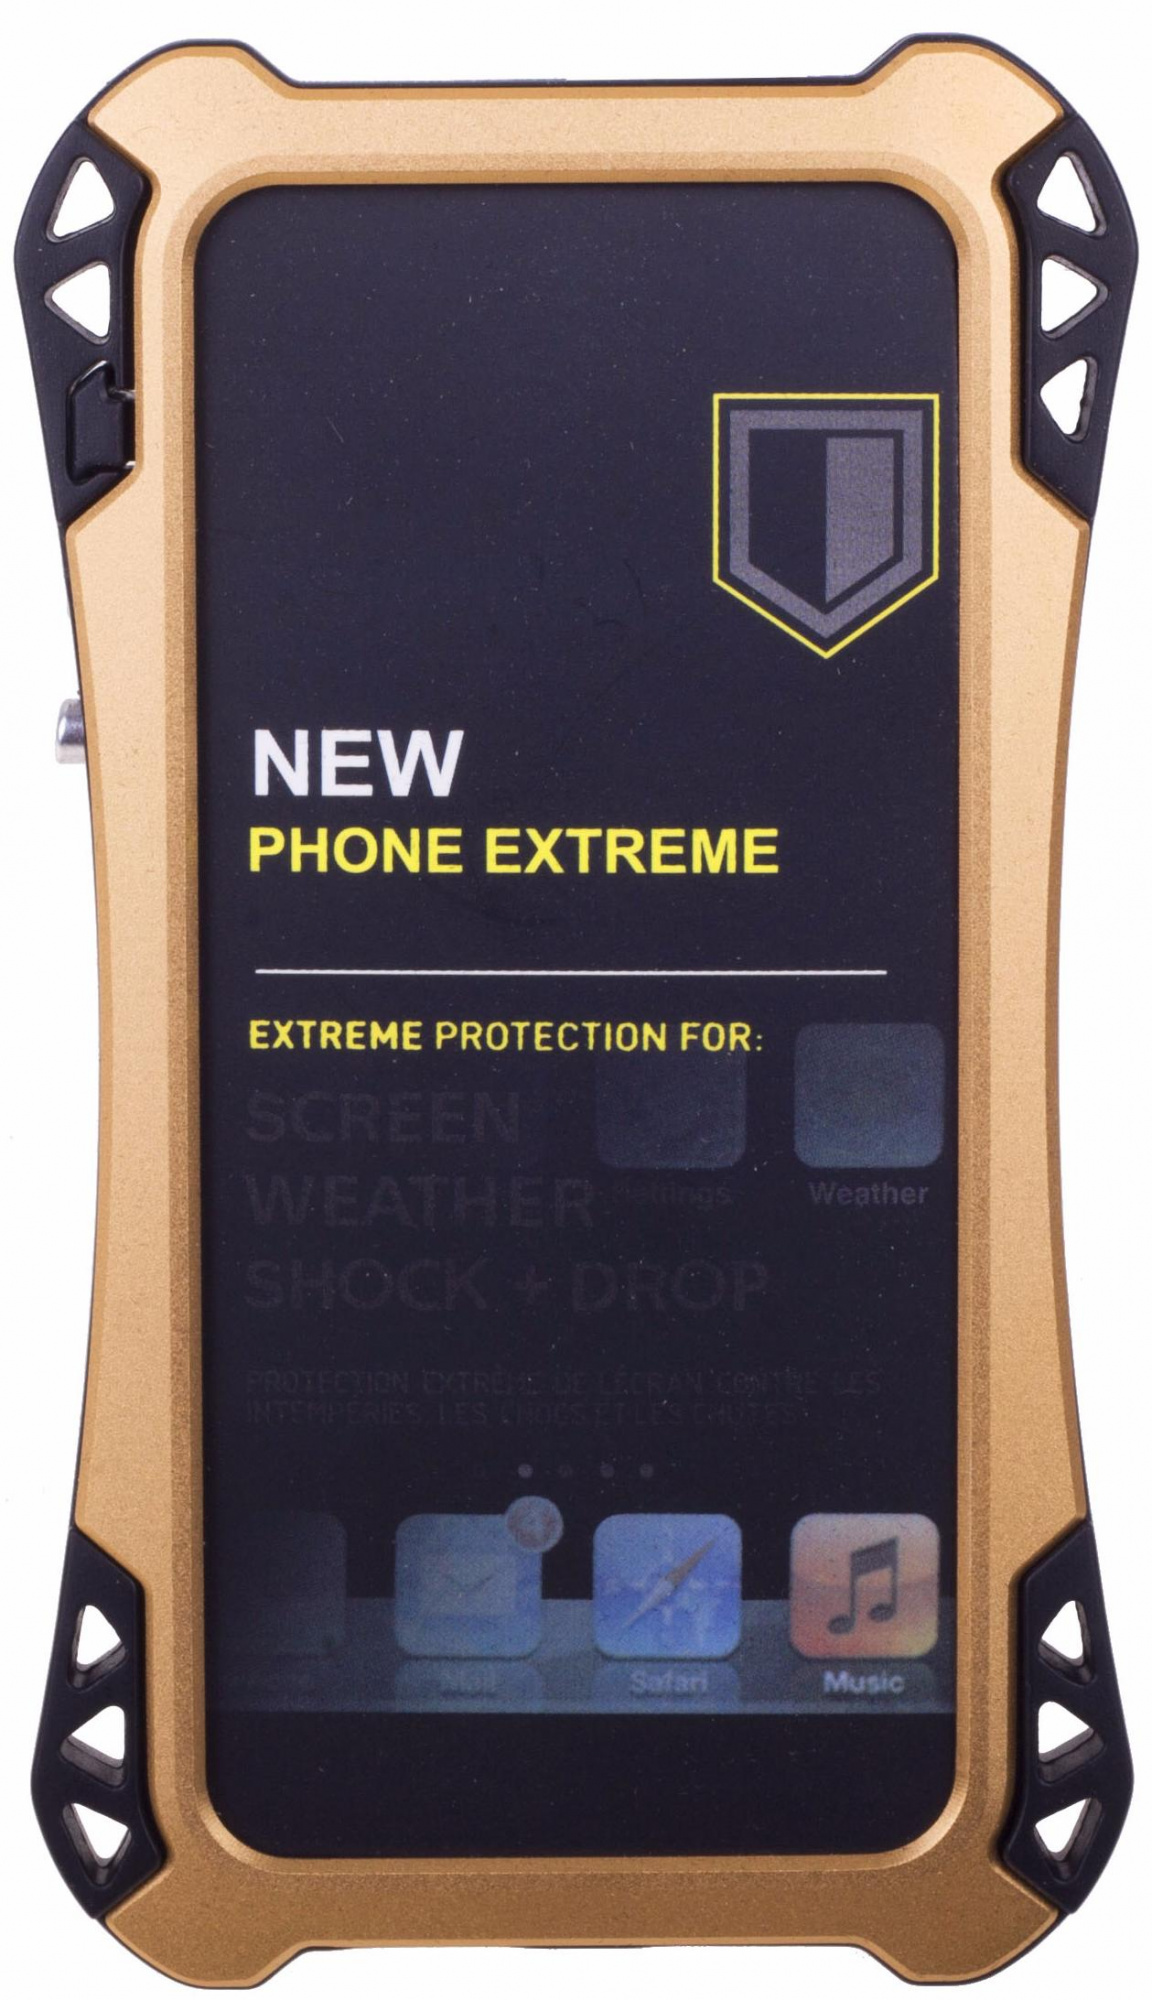 Amira Phone Extreme - защитный чехол для iPhone 5/5S/SE (Gold/Black)